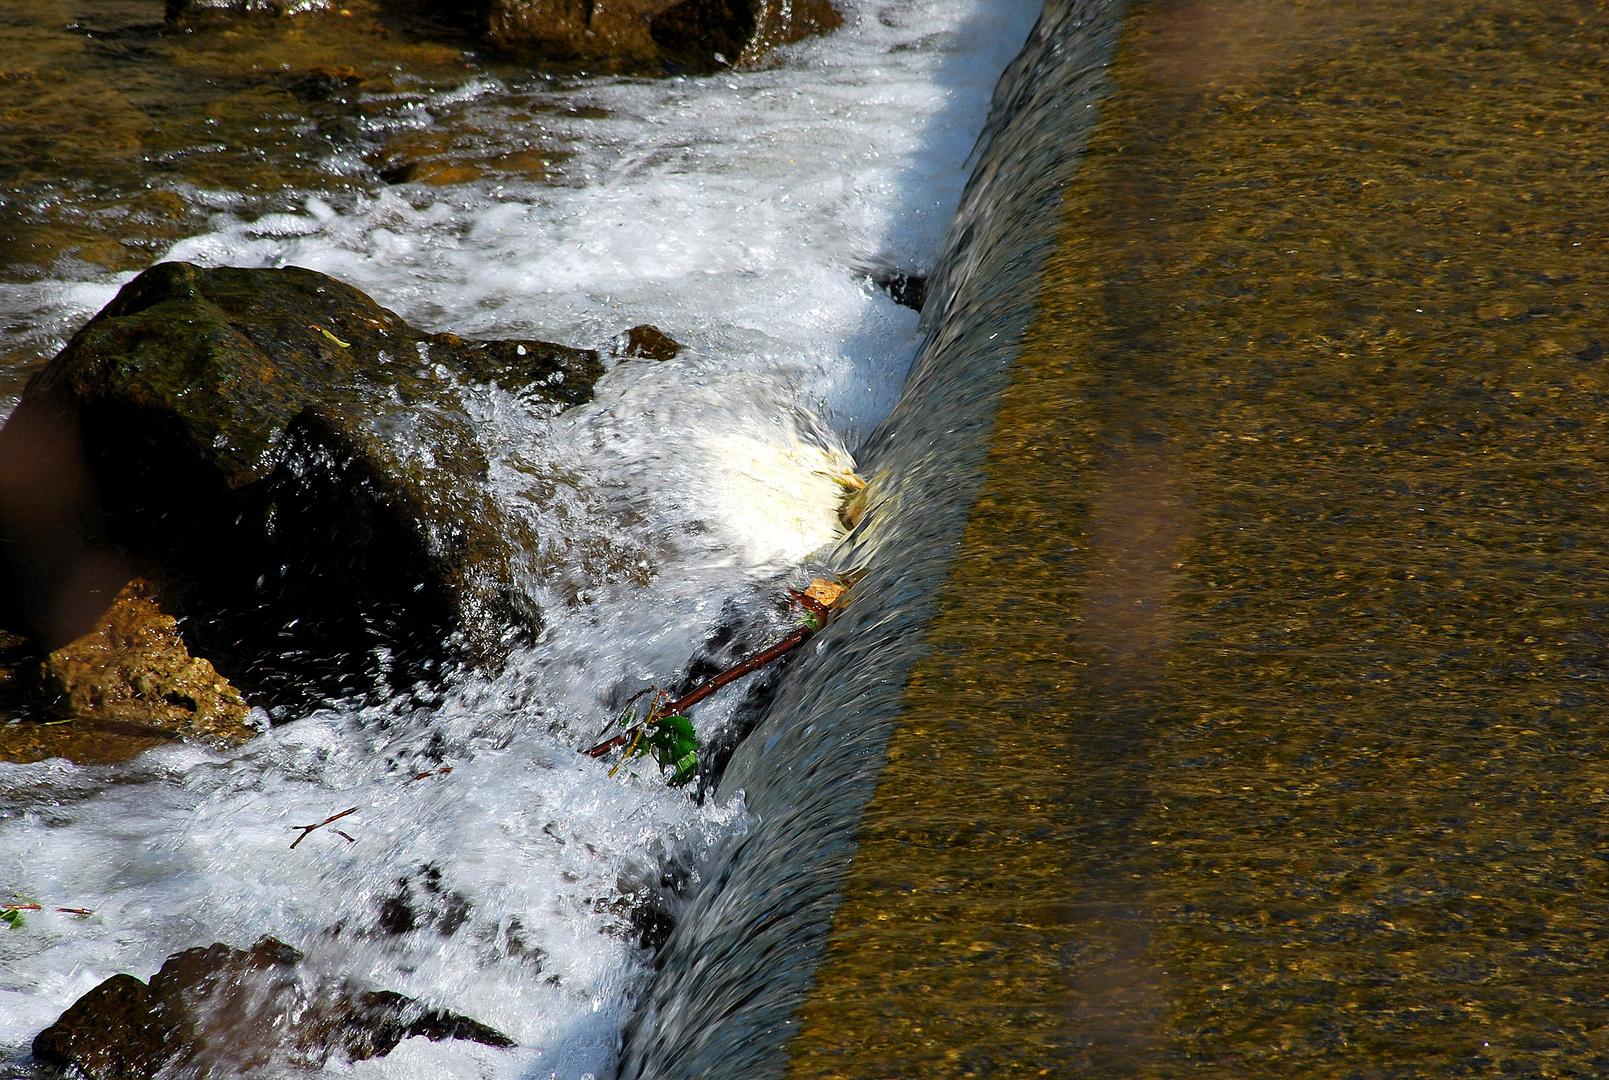 Wasserfall an der Weichsel